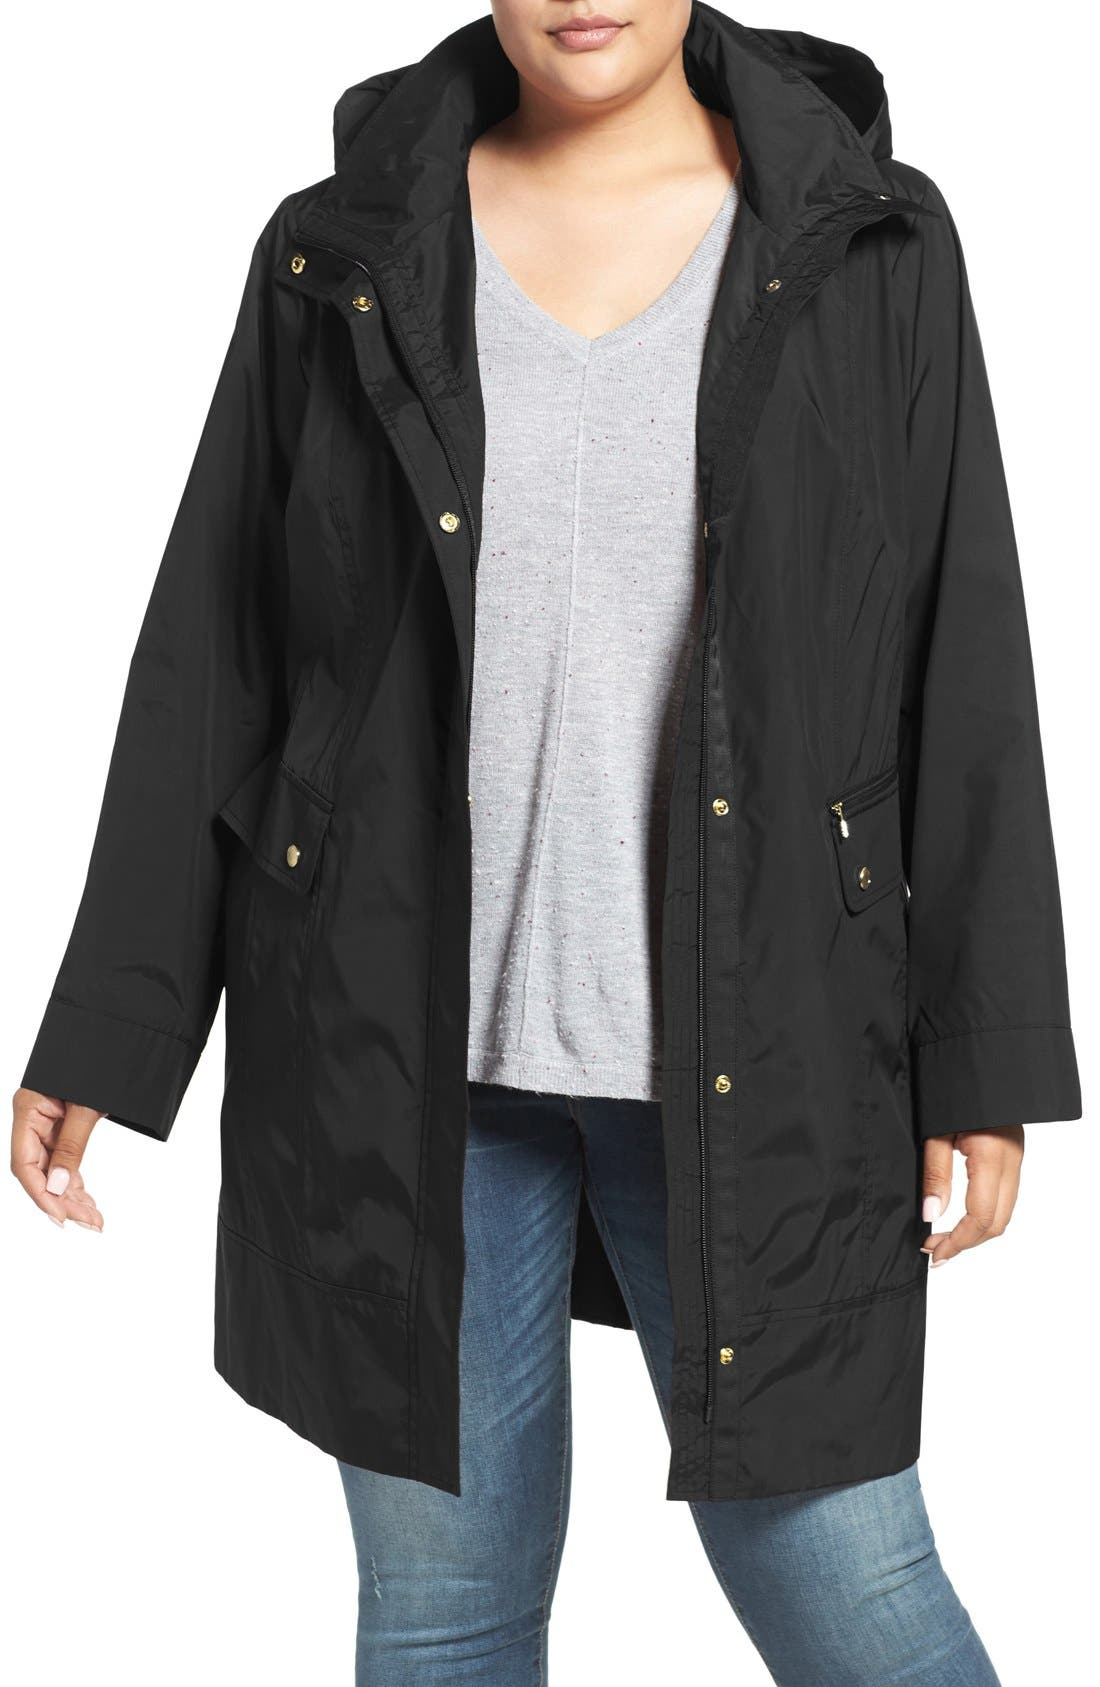 Cole Haan Water Resistant Rain Jacket,                             Main thumbnail 1, color,                             001